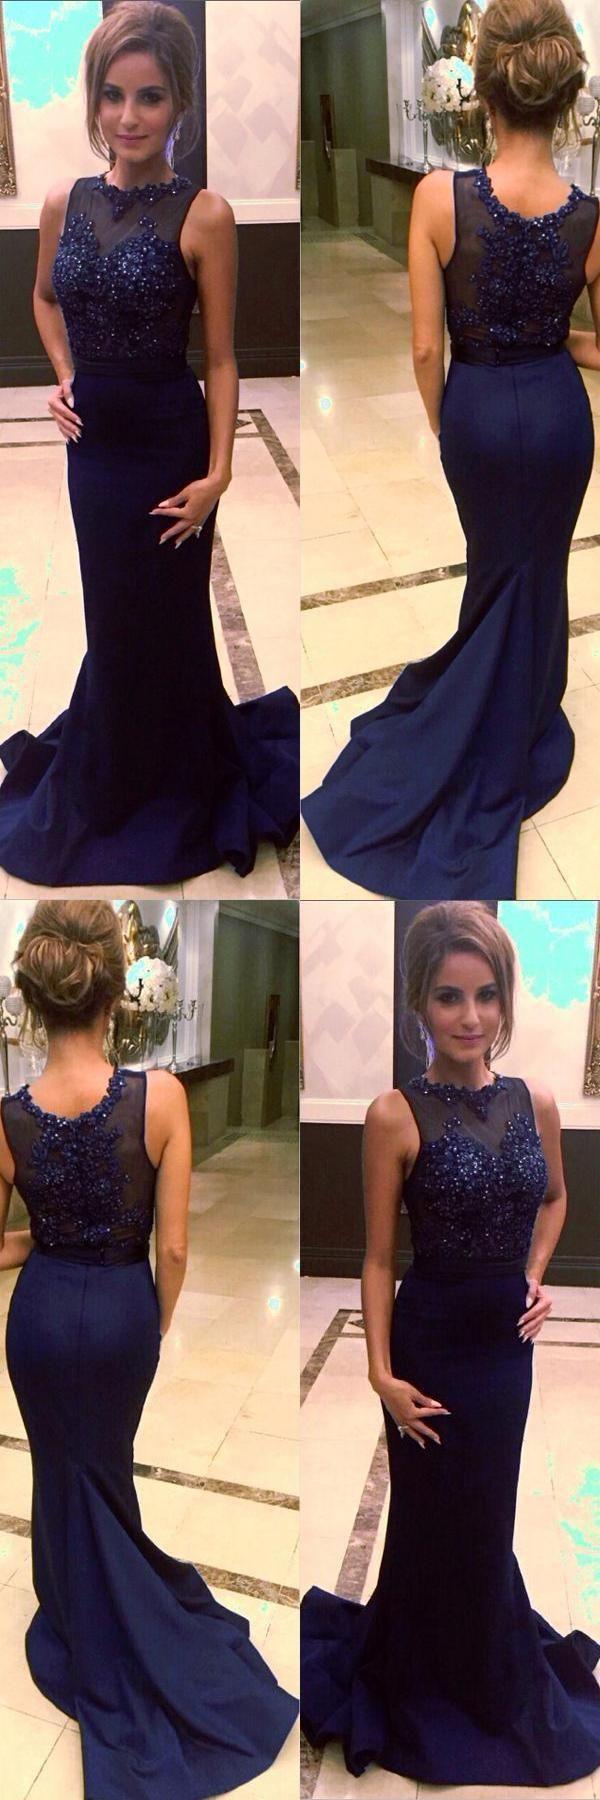 Custom made distinct navy blue prom dresses blue prom dresses